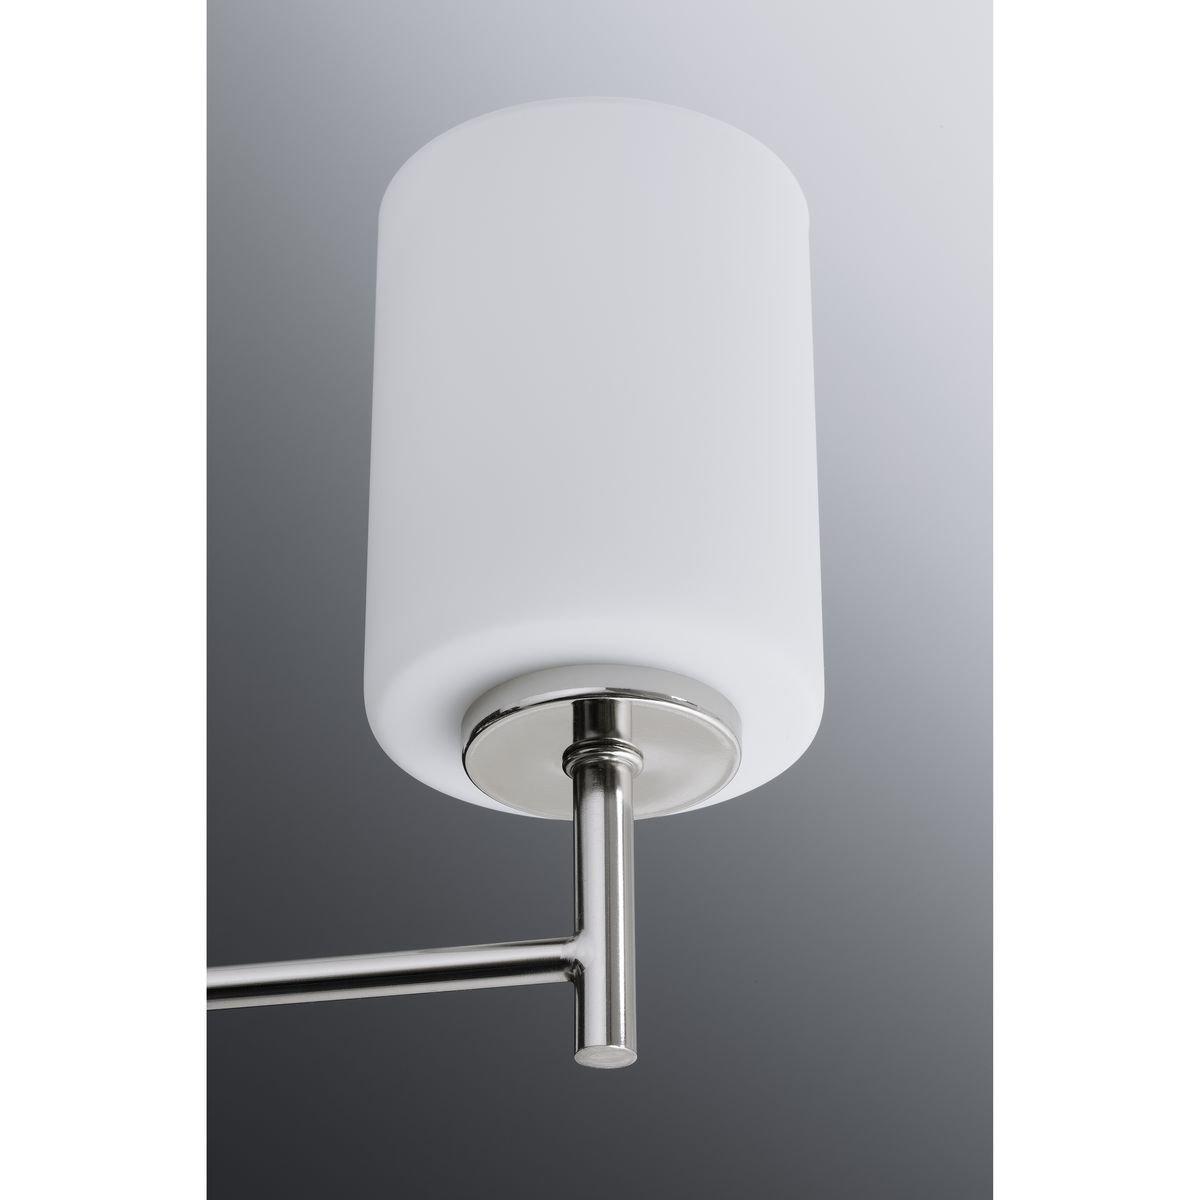 Progress Lighting P2159-09 Contemporary/Soft 3-100W Med Bath Bracket, Brushed Nickel by Progress Lighting (Image #7)